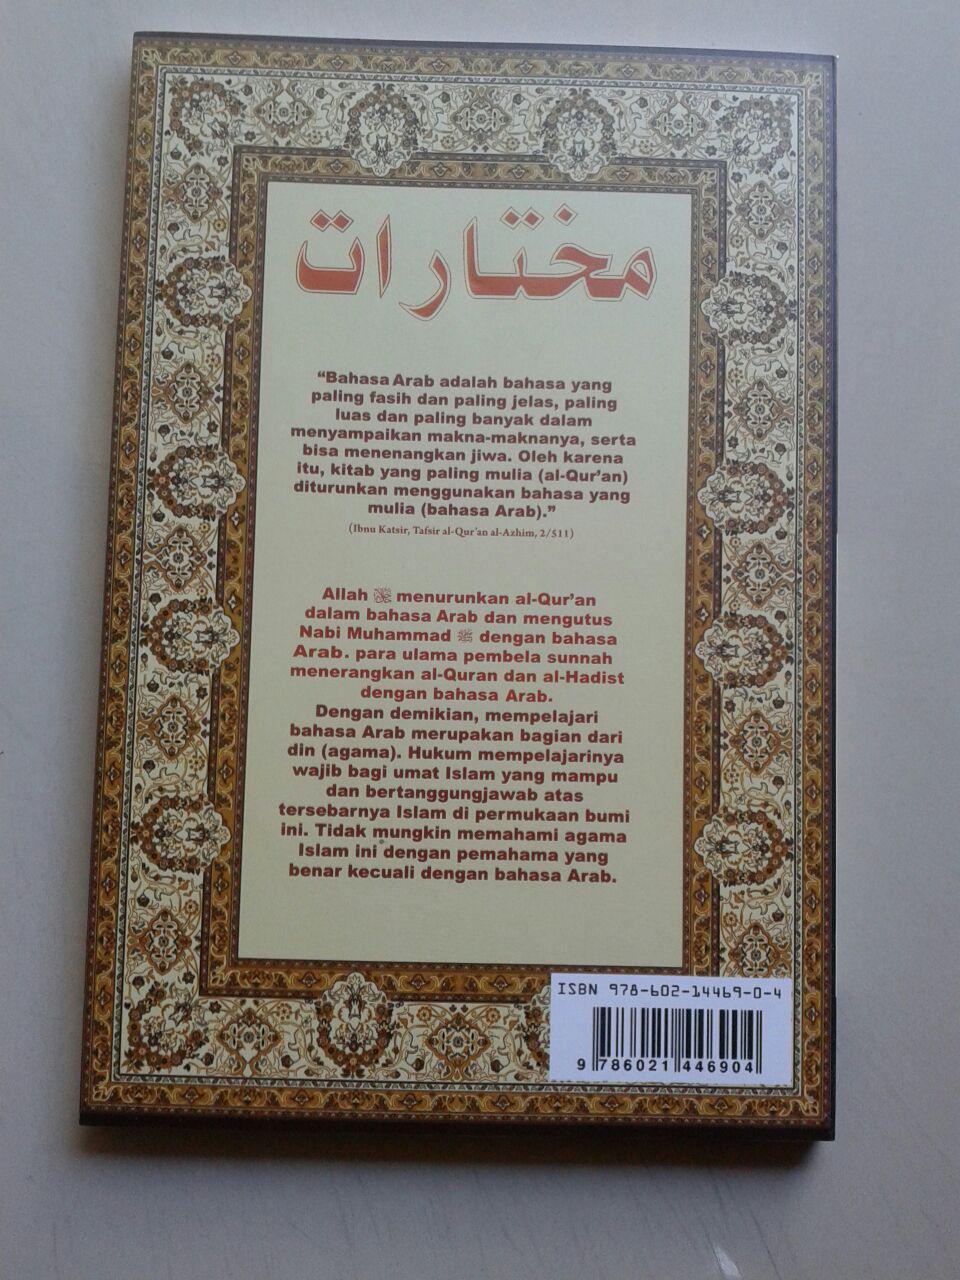 Buku Mukhtarot Ringkasan Kaidah Bahasa Arab cover